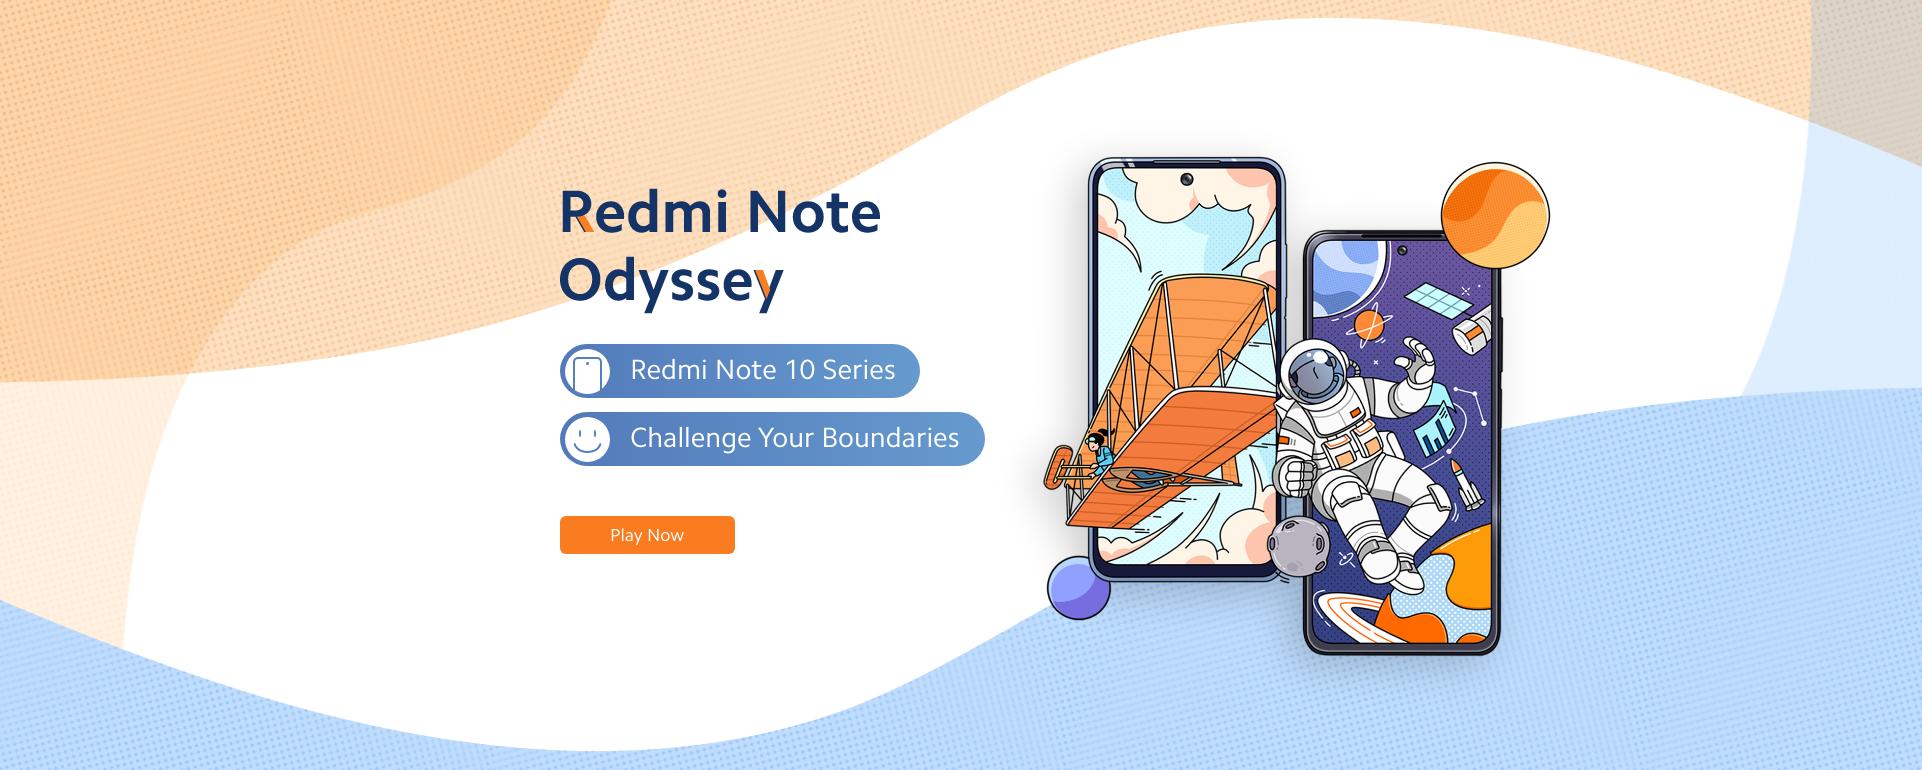 Redmi note Odyssey